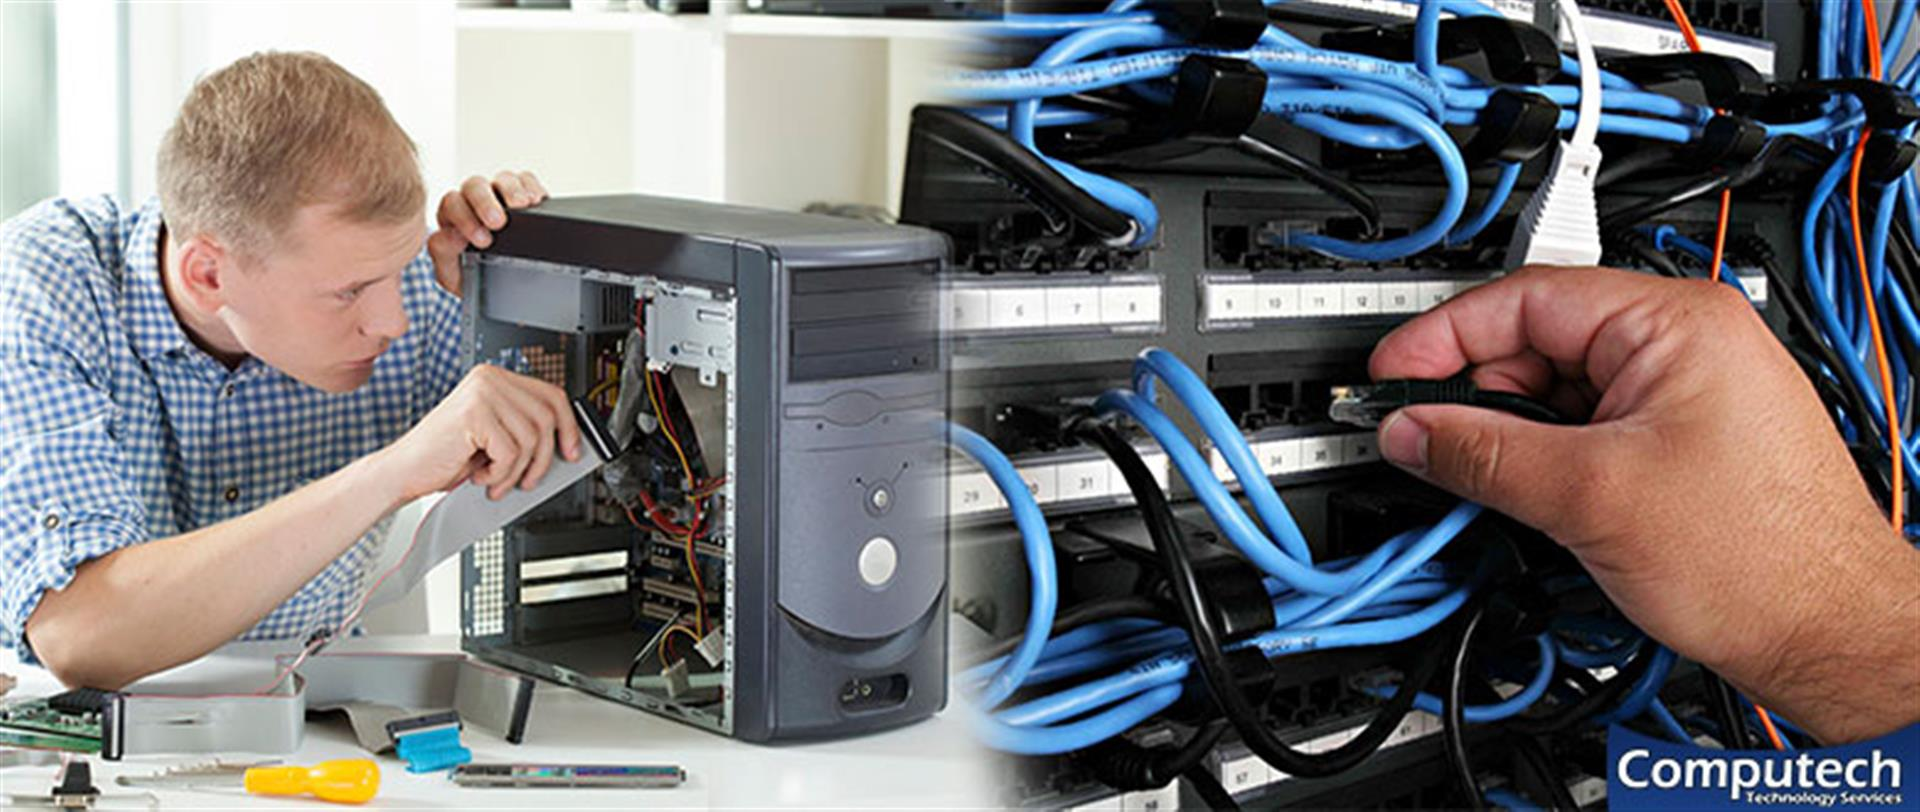 Saltville Virginia Onsite PC & Printer Repair, Network, Voice & Data Cabling Solutions